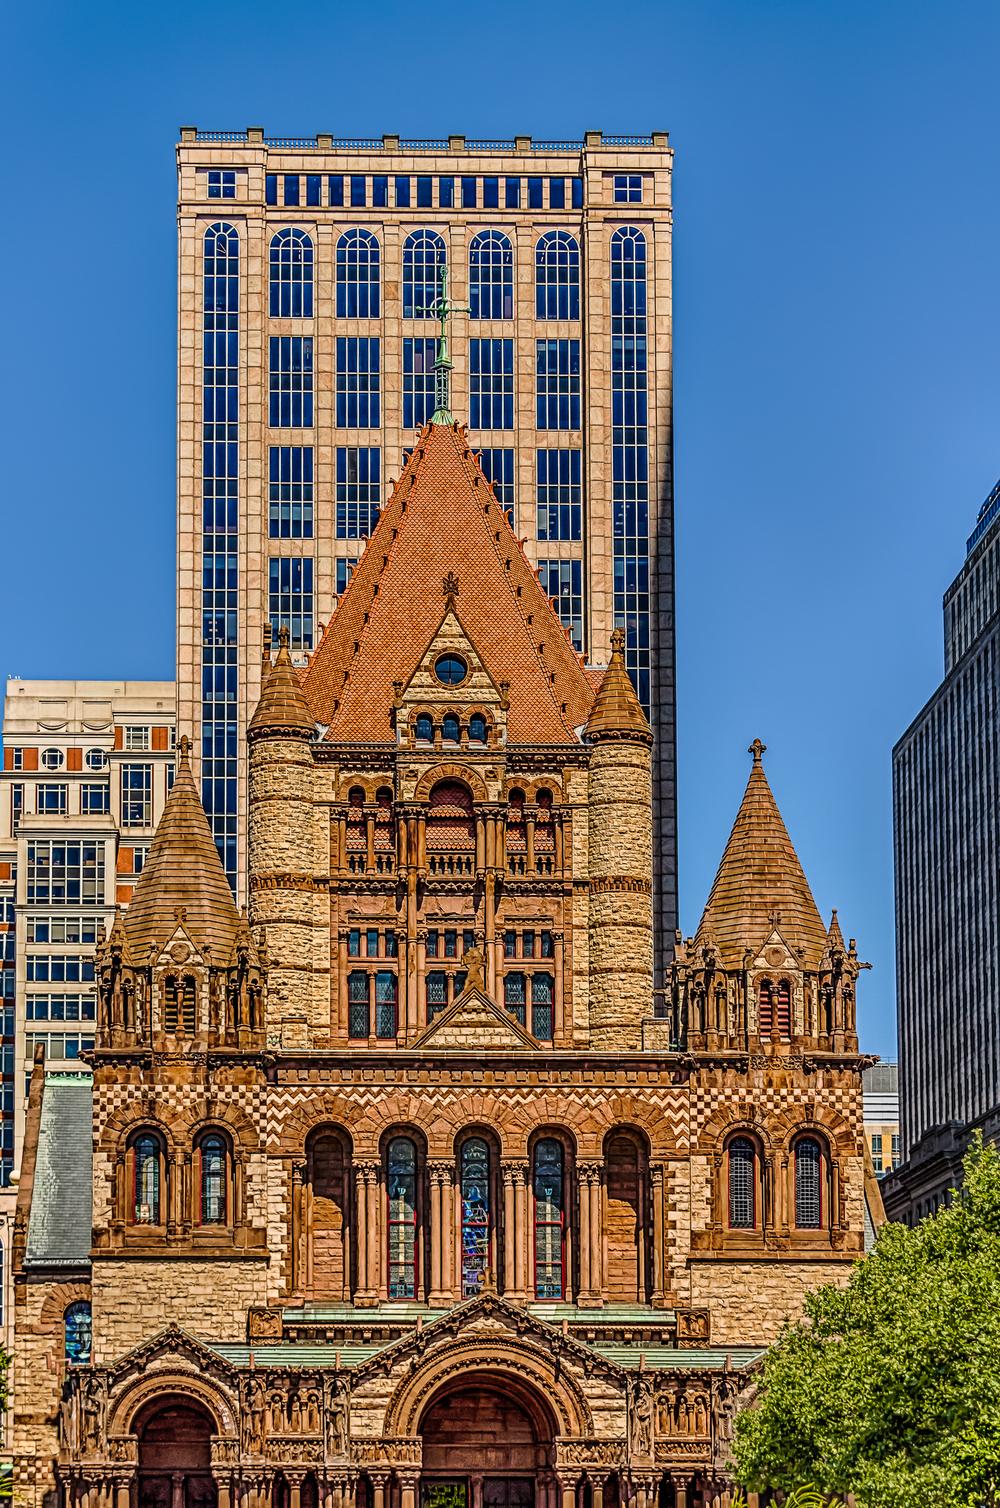 20140721_Boston Vacation 2014_IMG__HDR-75-M.jpg